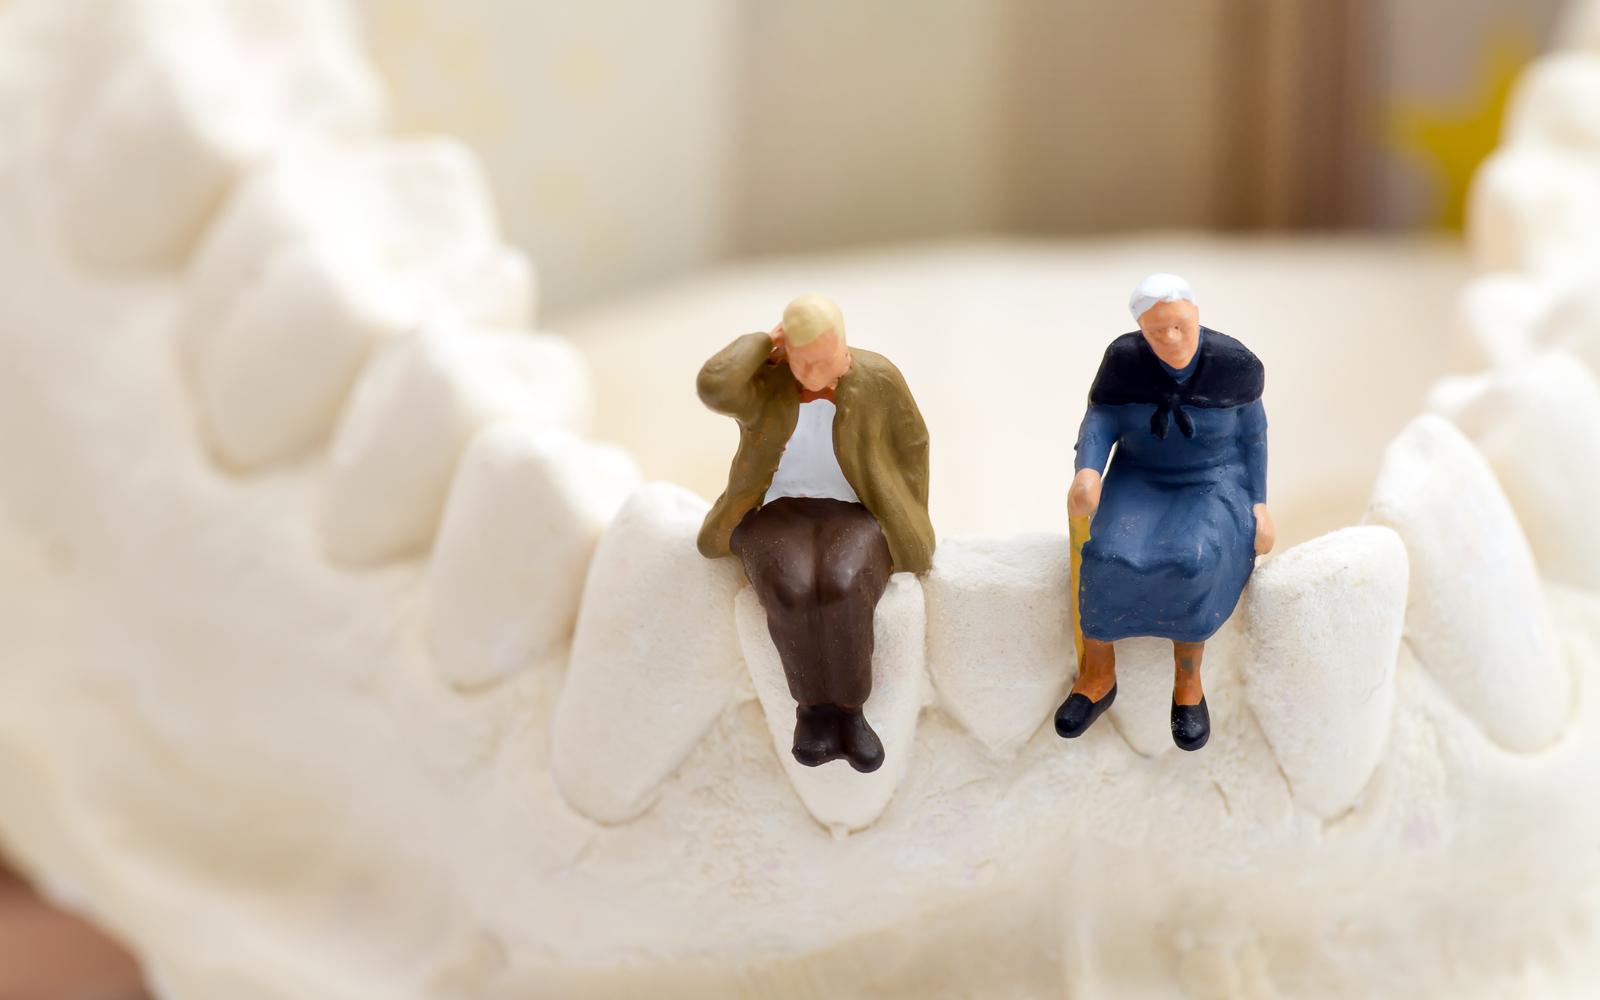 Elderly couple sitting on teeth